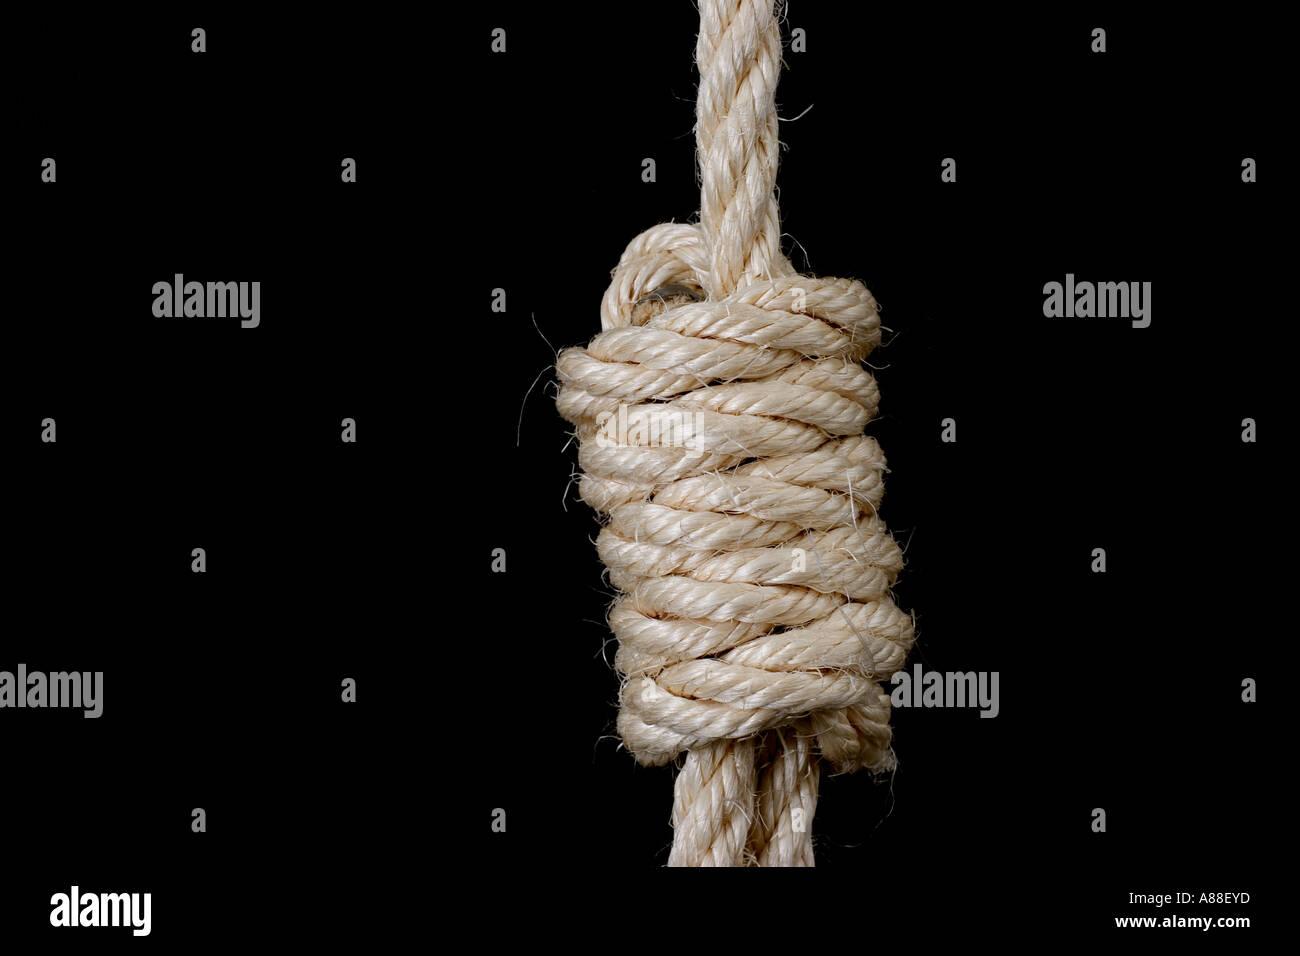 Rope Hang Man's Noose on black background - Stock Image